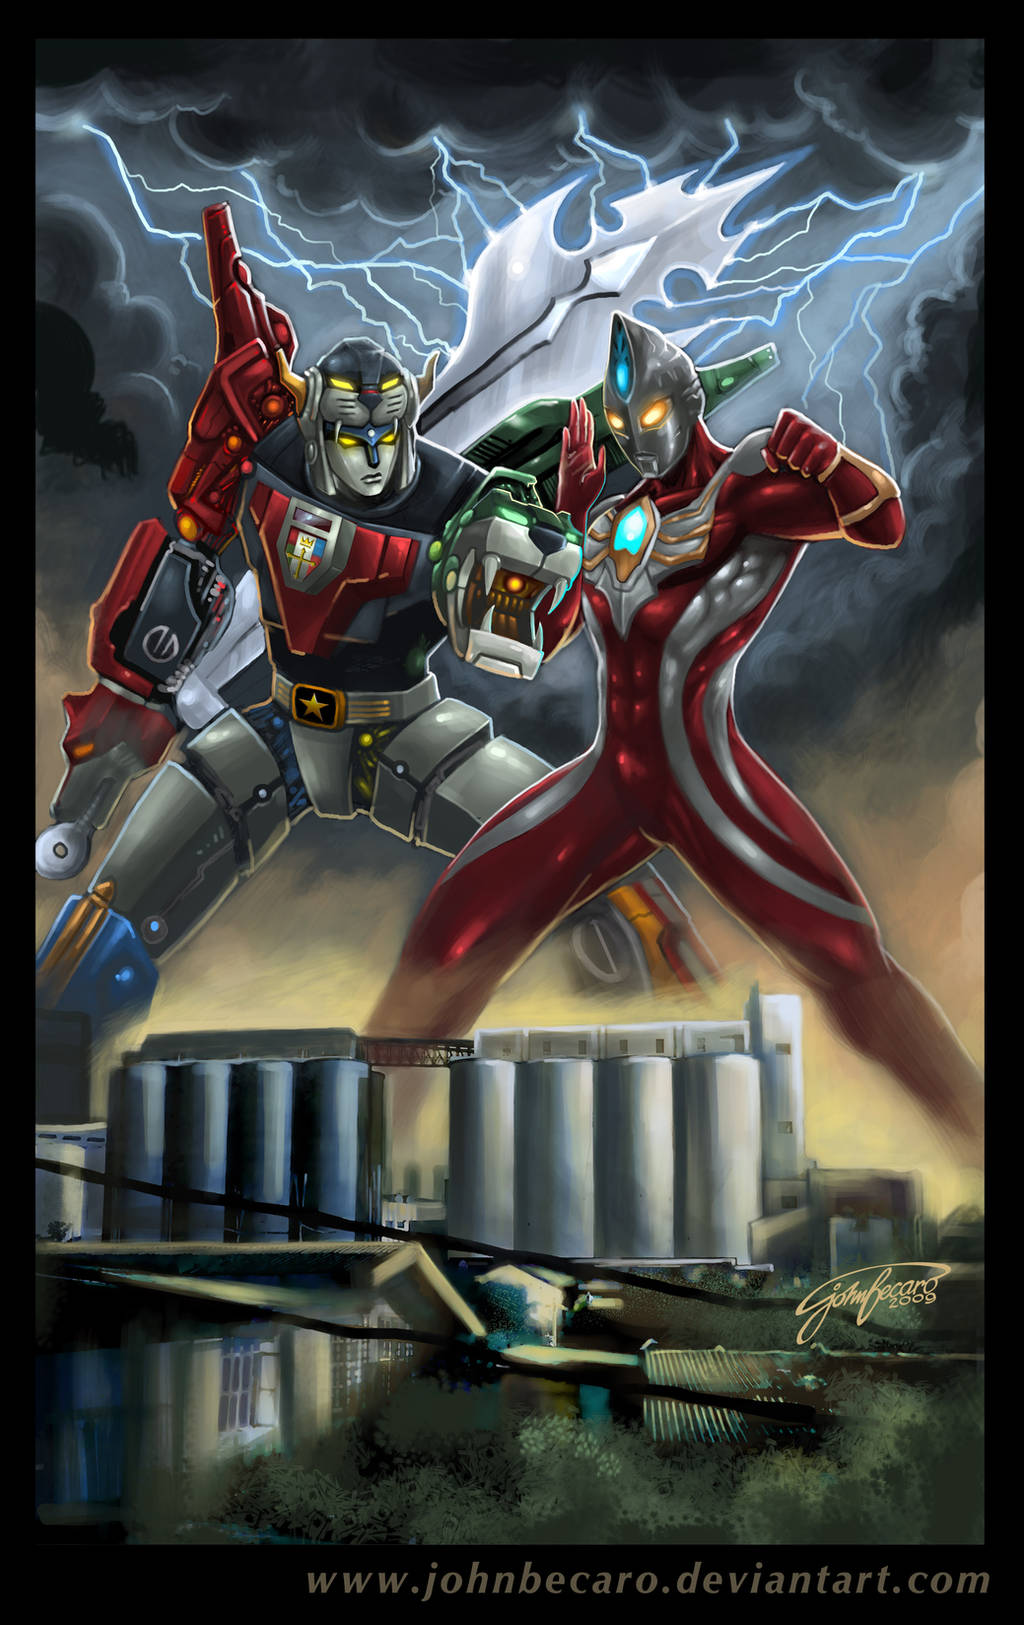 Voltron Vs Ultraman Max by johnbecaro